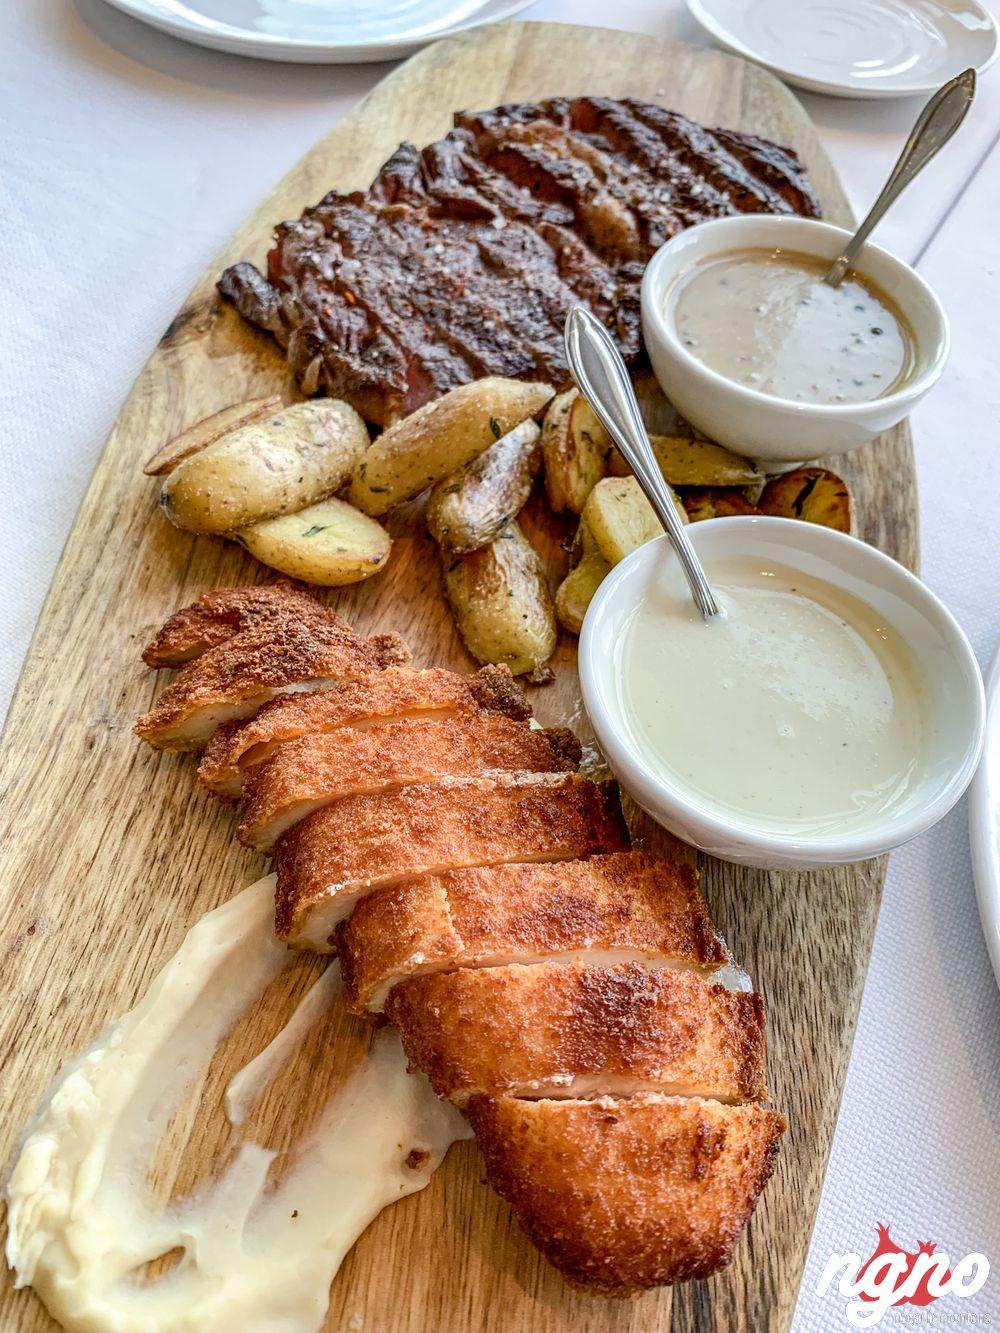 chez-charles-dubai-food-nogarlicnoonions-372018-11-23-06-33-11